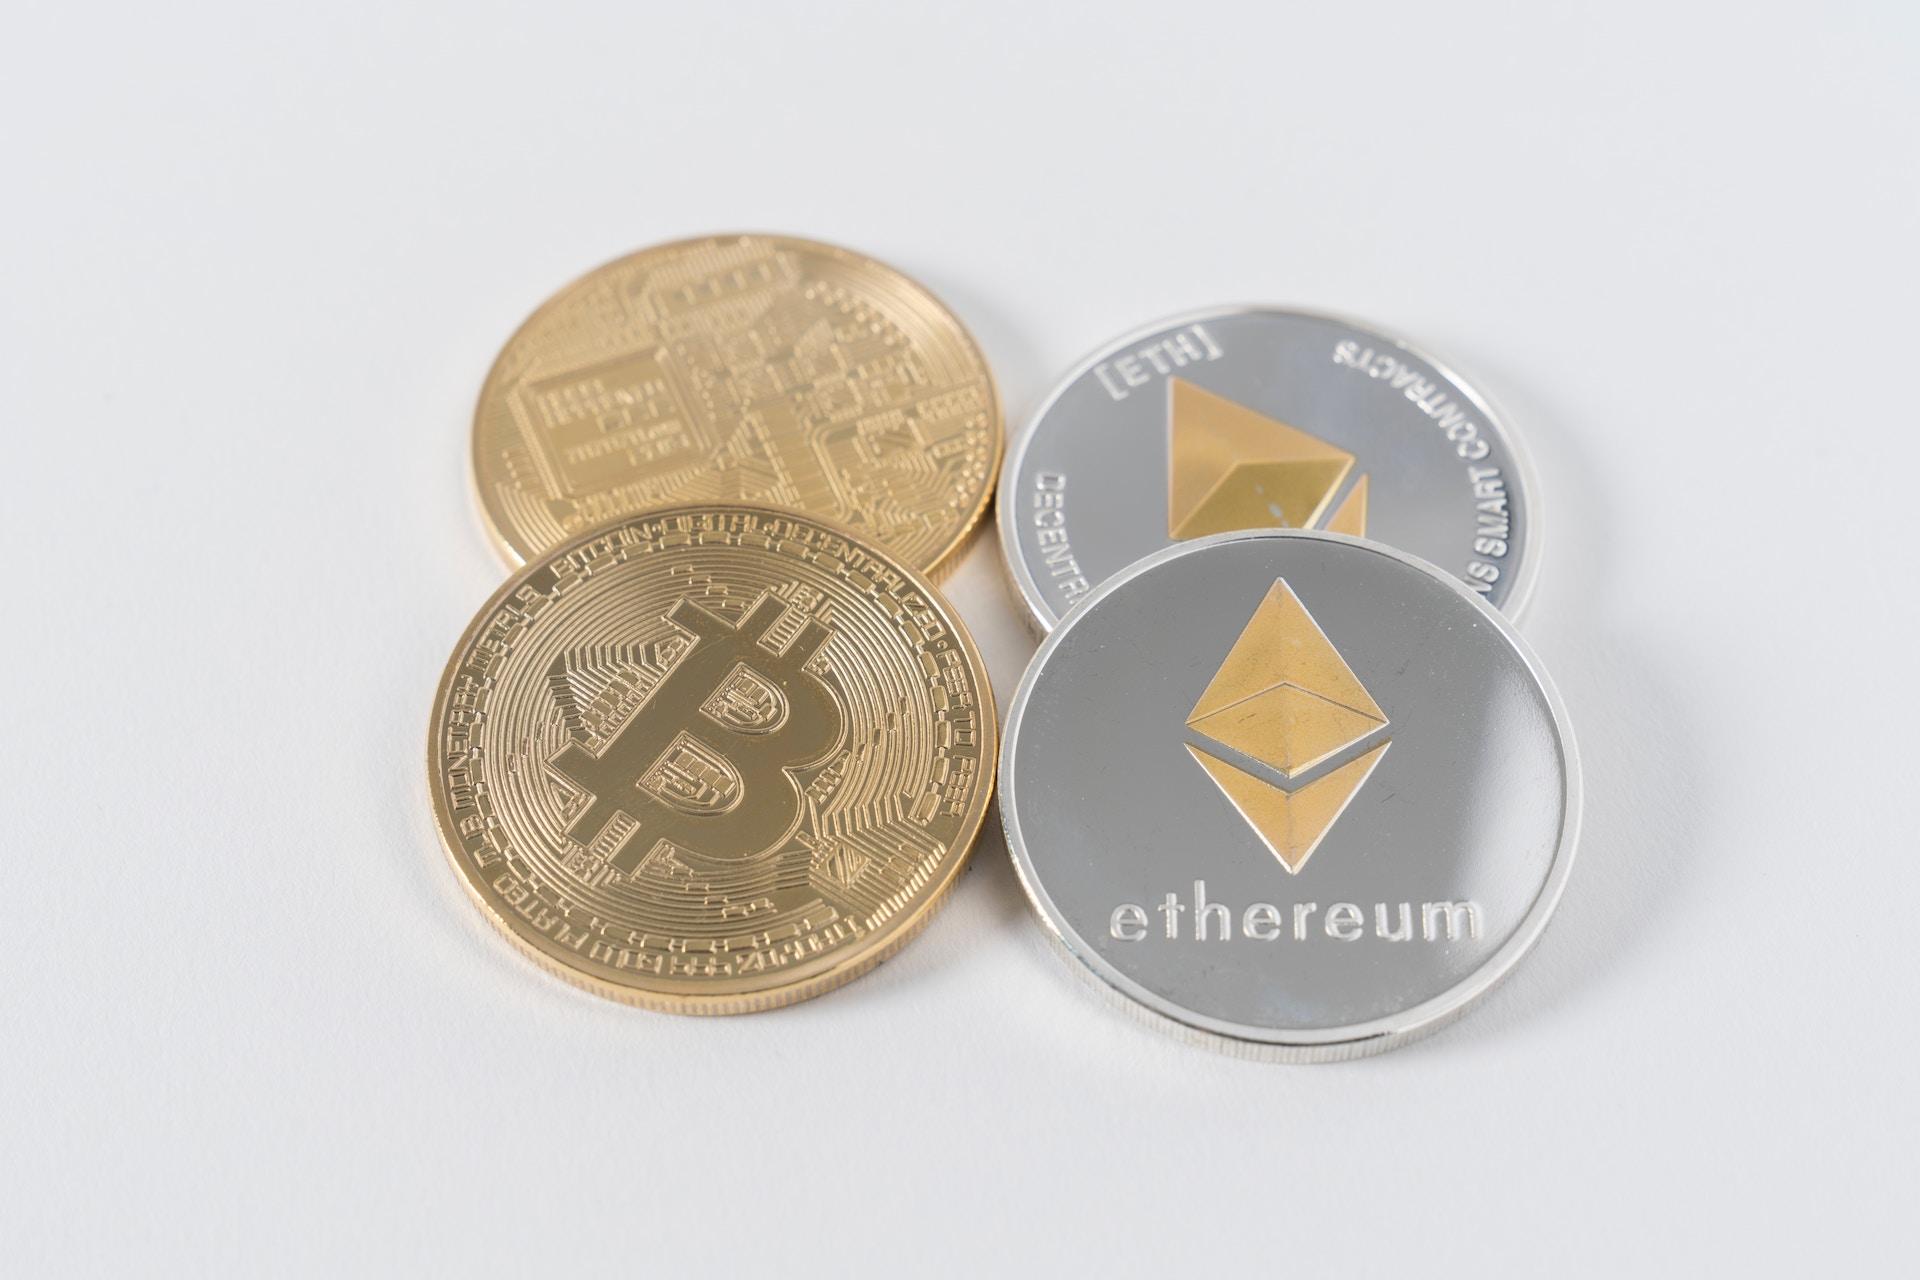 Bitcoin, Ethereum: coins based on blockchain.